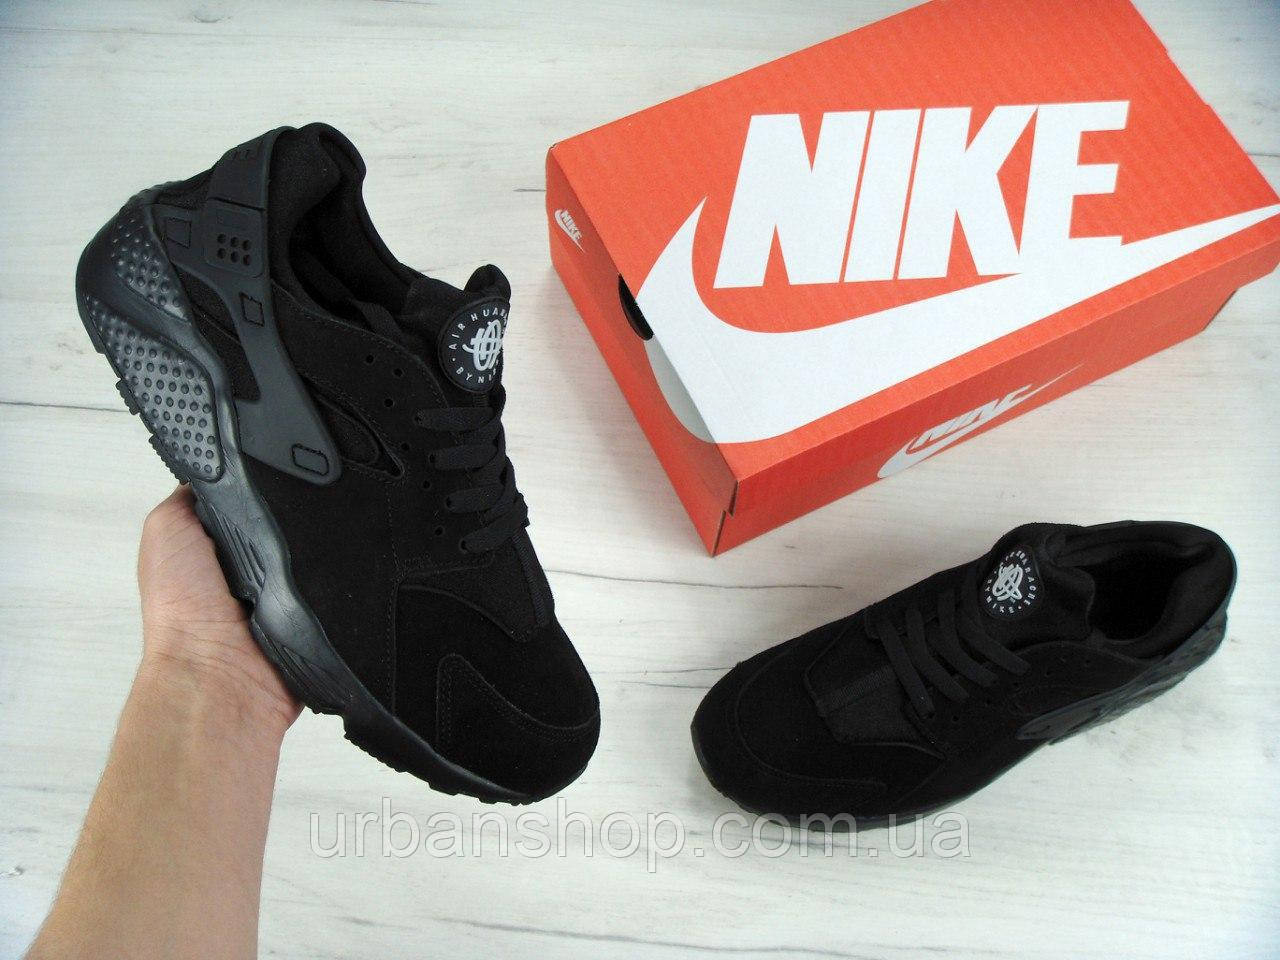 633c8b5592dd Зимние мужские кроссовки Nike Air Huarache All Black Winter Edition, найк,  айр хуараче